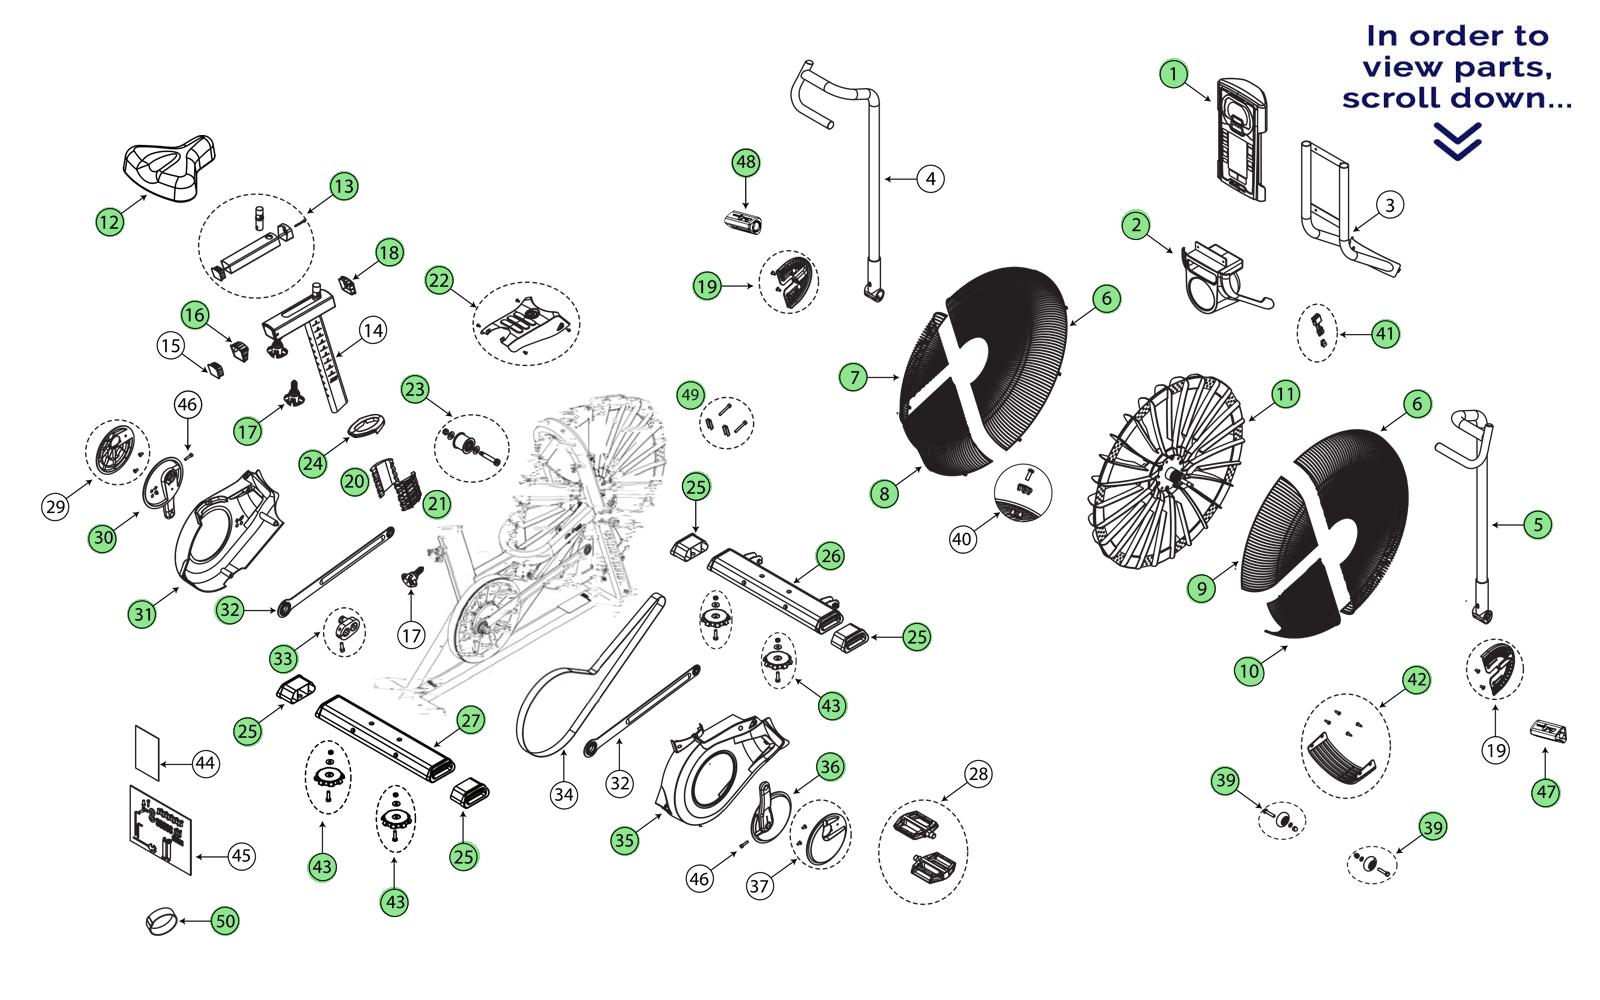 Schwinn Airdyne Pro Repair Parts